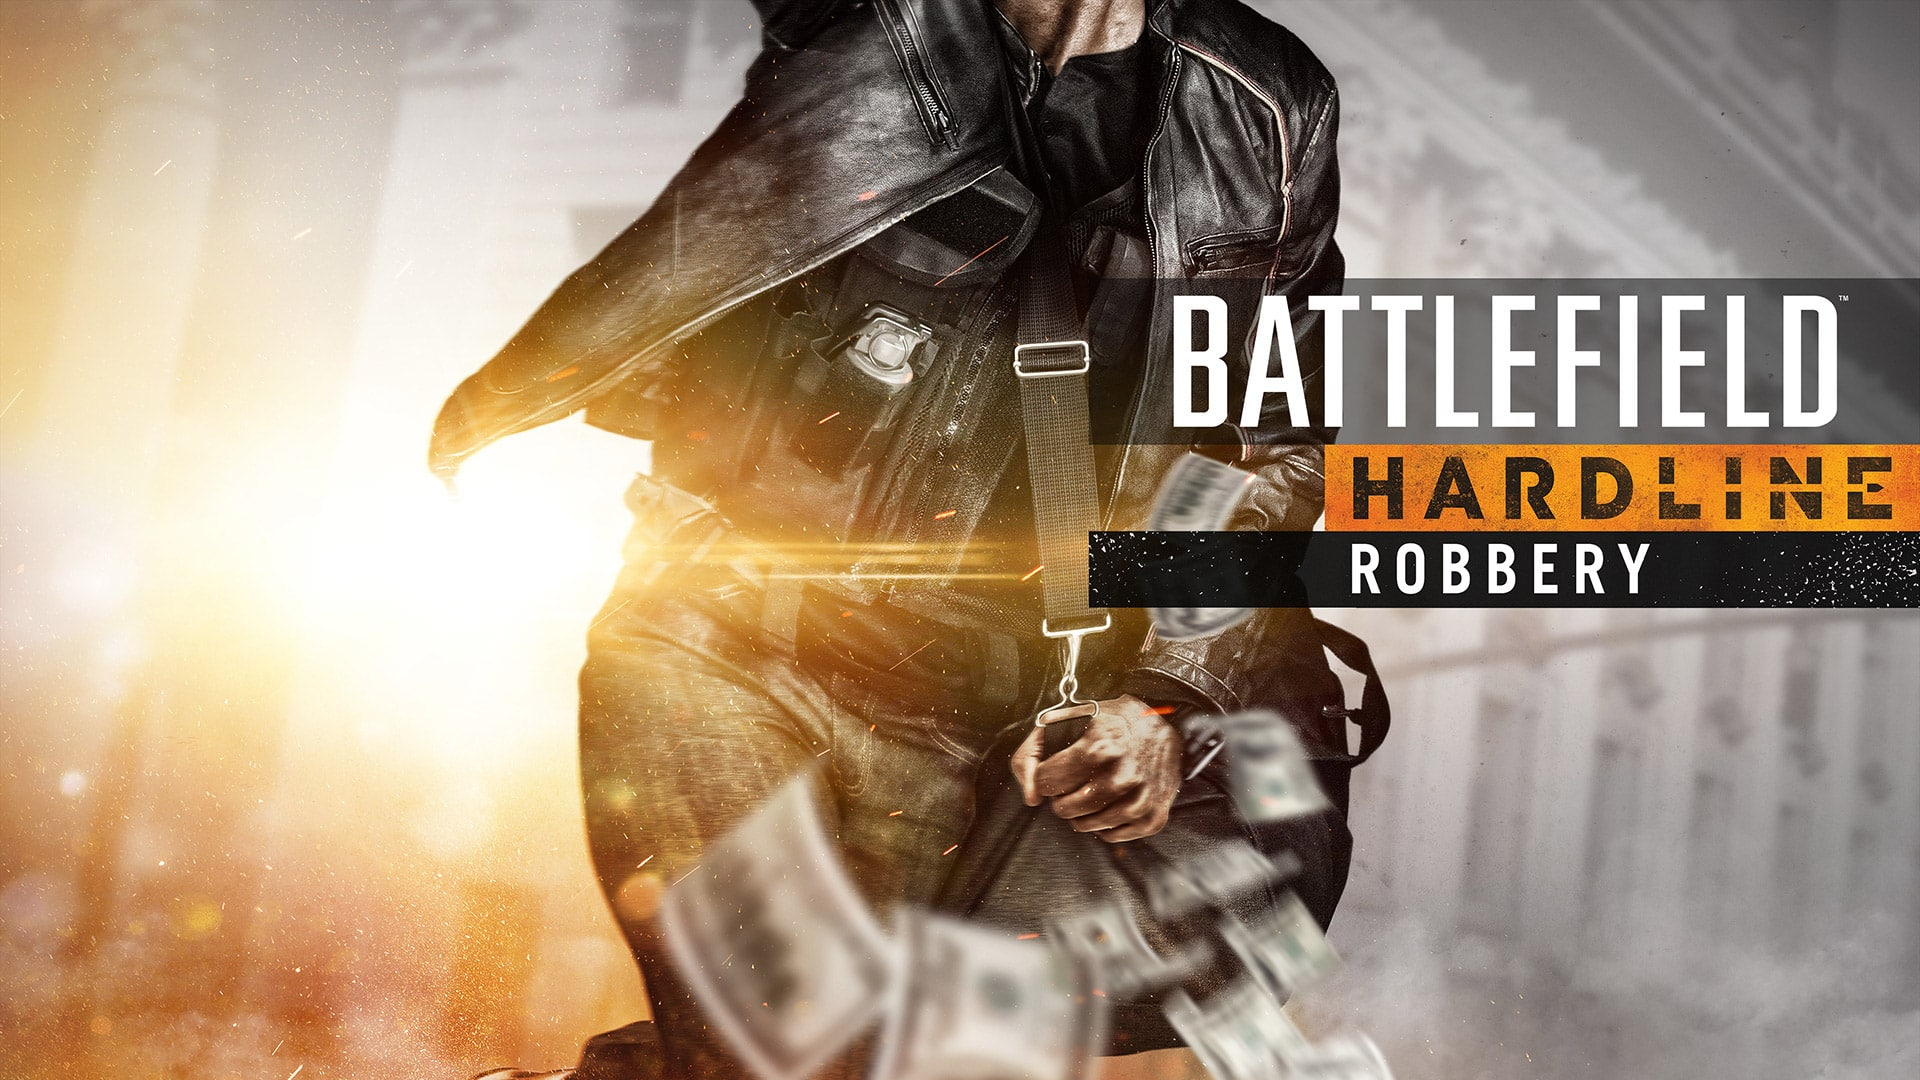 Battlefield Hardline - robbery